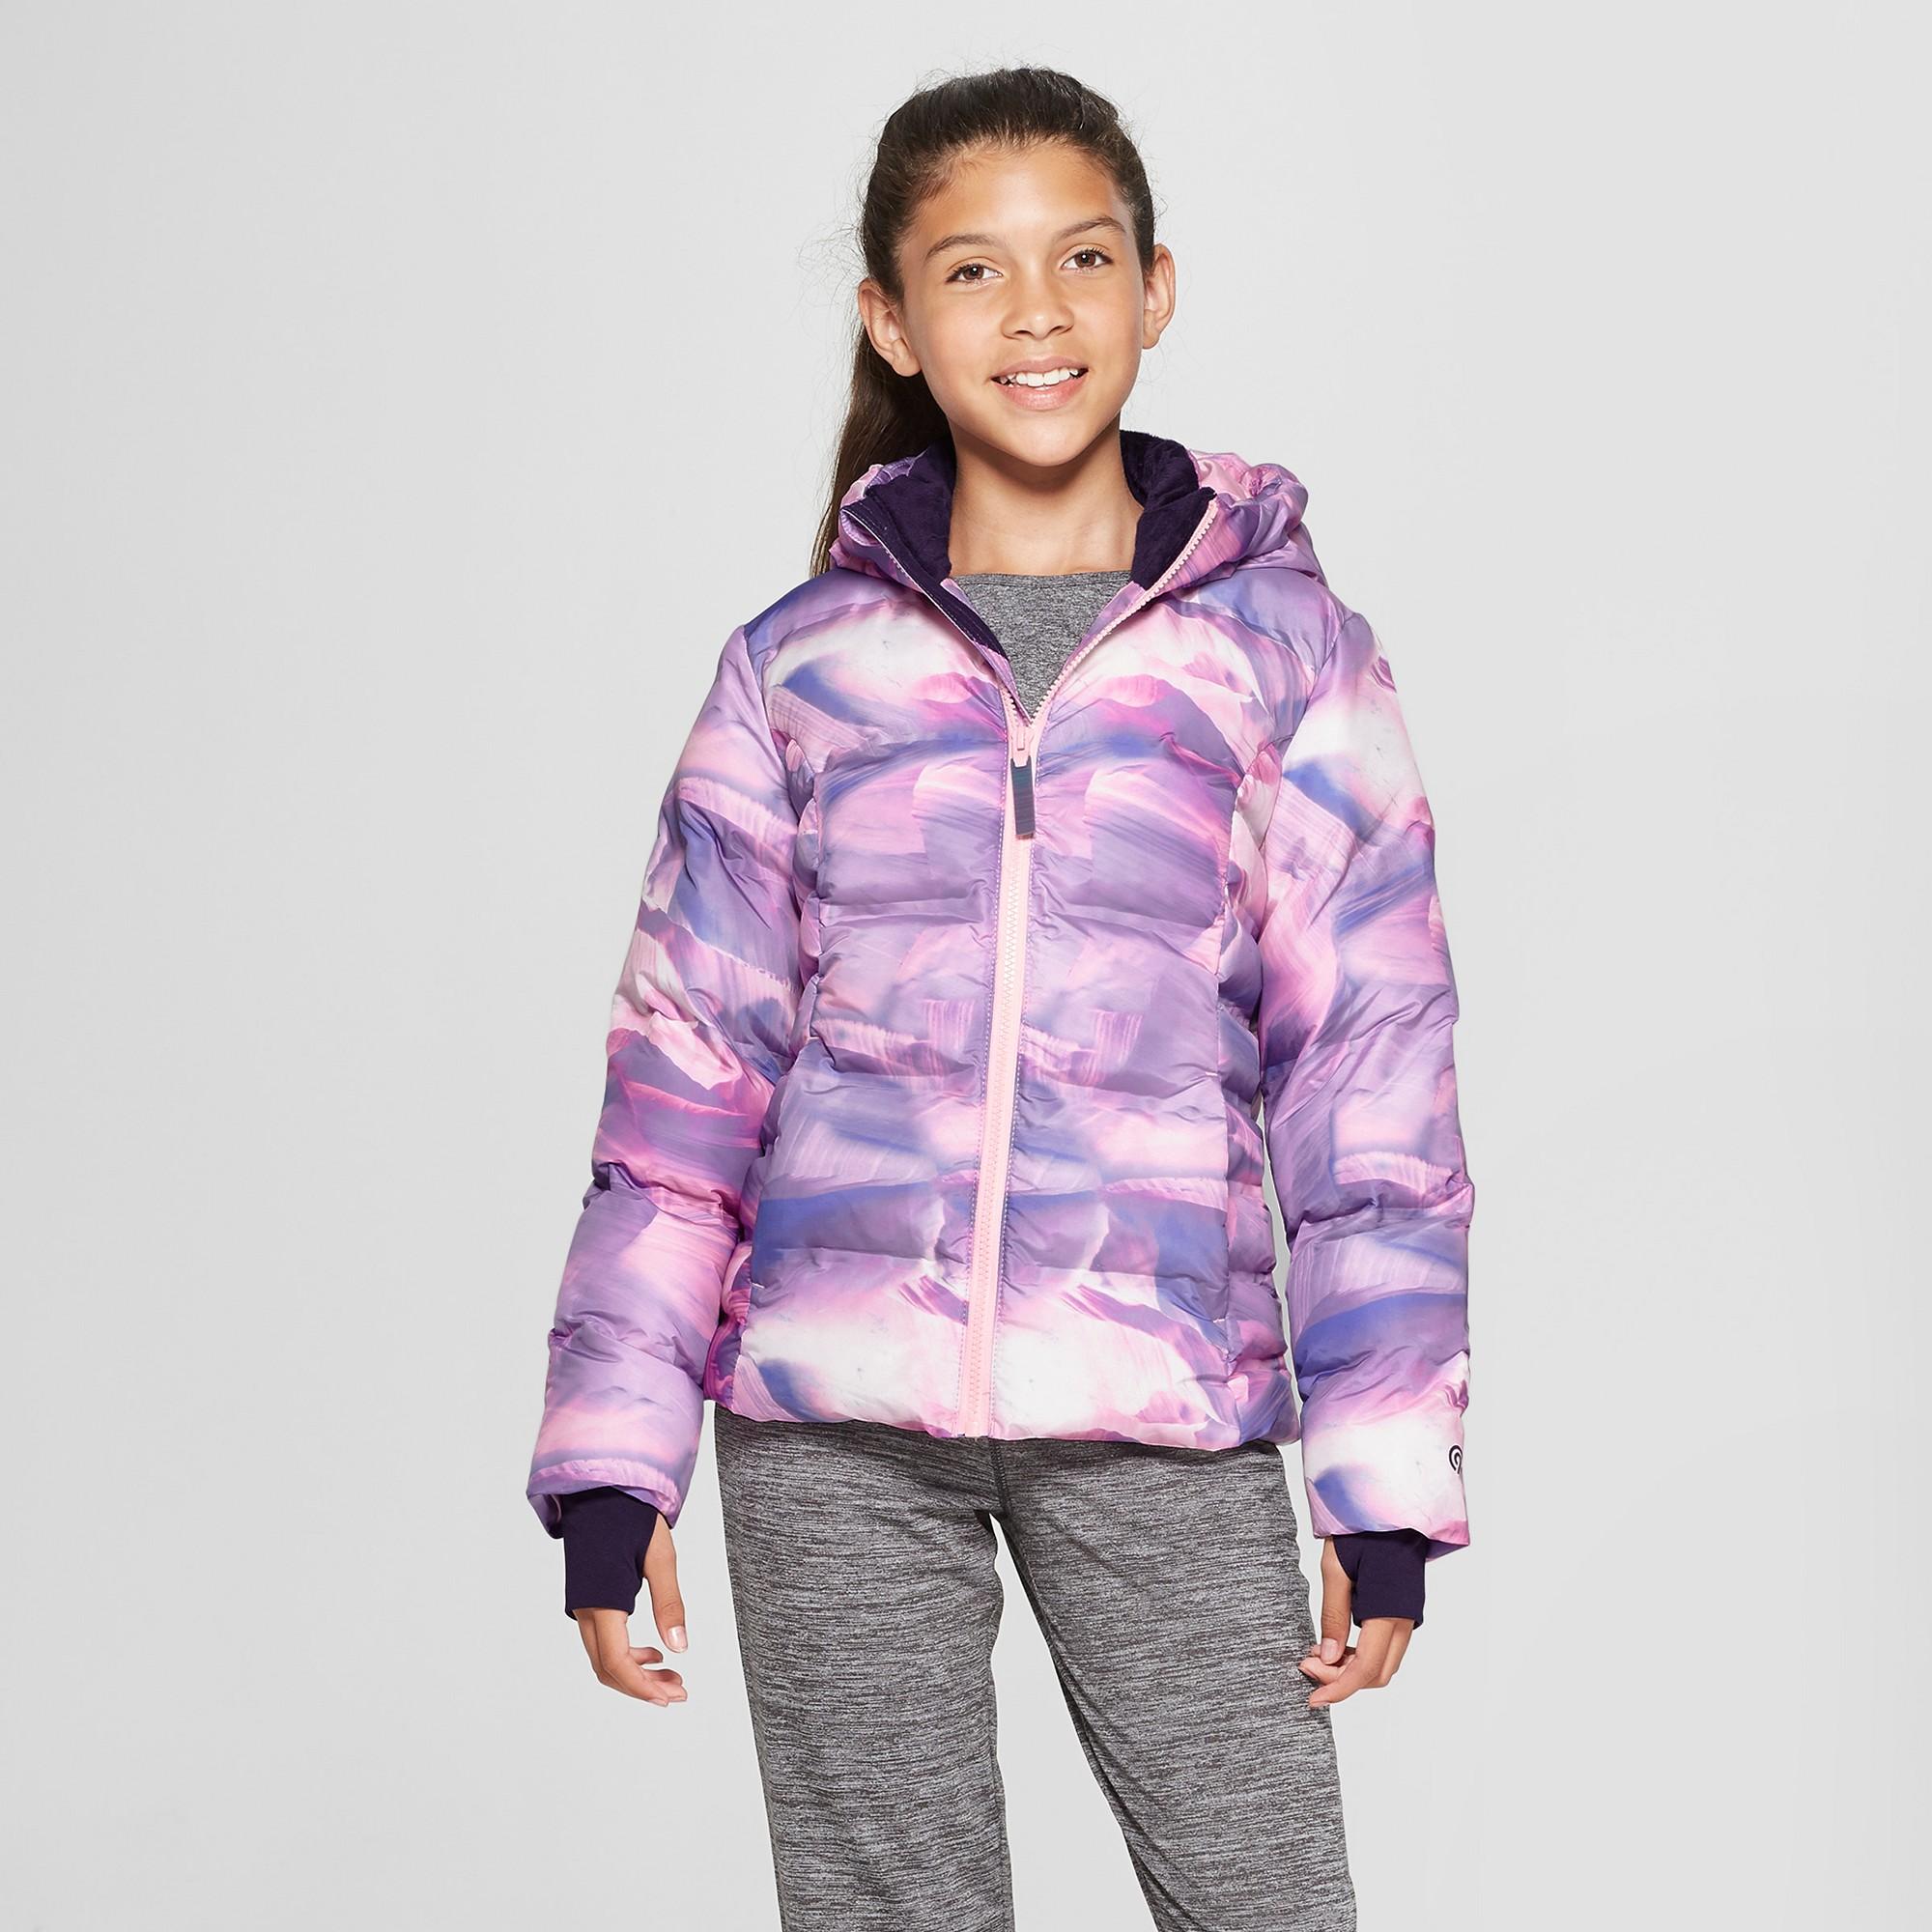 4e4abe8c5d57 Girls  Printed Puffer Jacket - C9 Champion Lilac Xxl